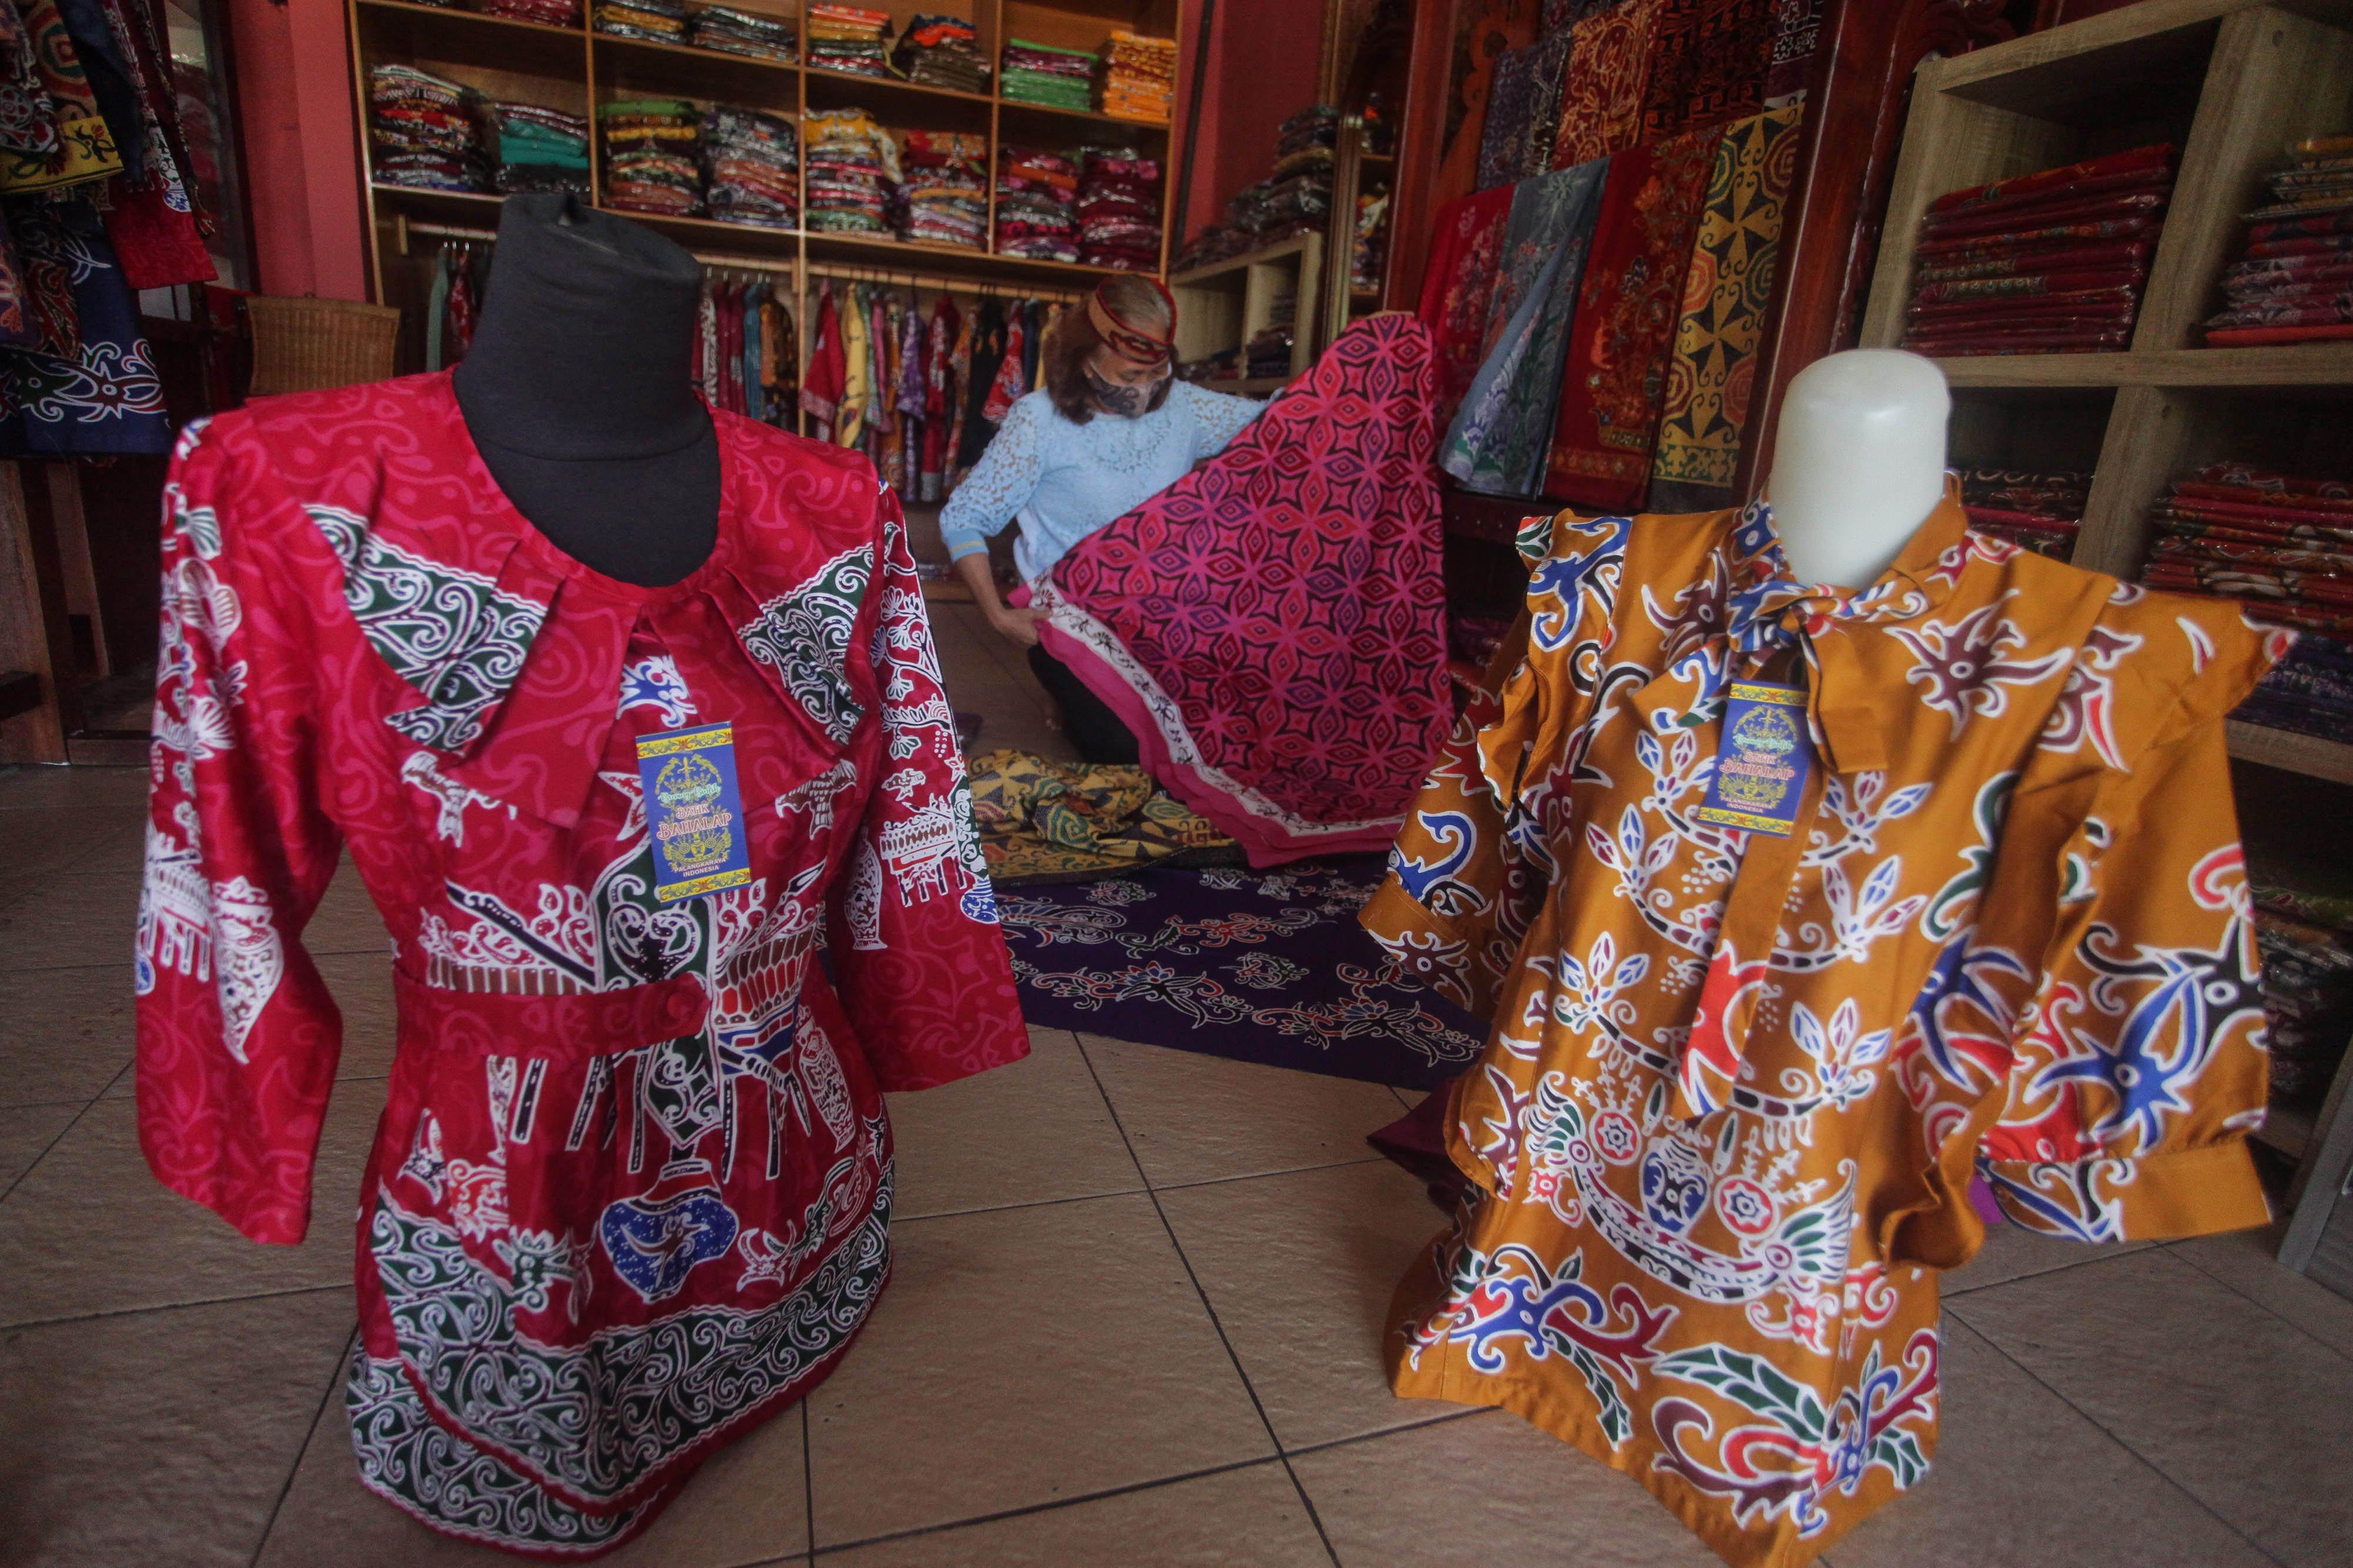 Perajin Batik Bahalap merapikan kain batik tulis motif khas Kalteng yang dijual di kiosnya, di Jalan Thamrin, Palangkaraya, Kalimantan Tengah, Senin (5/10/2020). Menurut perajin setelah penjualan terpuruk hingga 90 persen karena pandemi COVID-19, kini mulai berangsur pulih kembali dengan menerima berbagai pesanan dari instansi pemerintahan dan pasar online dengan harga jual Rp350 ribu hingga Rp1 juta tergantung jenis motif dan ukuran. ANTARA FOTO/Makna Zaezar/pras.